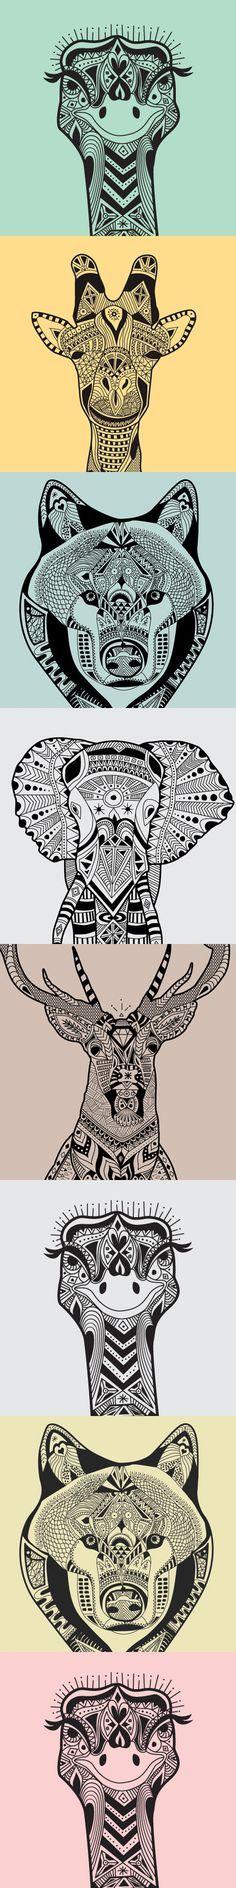 wild animals zentangle patterns - Zentangle - More doodle ideas - Zentangle - doodle - doodling - zentangle patterns. zentangle inspired - #zentangle #doodling #zentanglepatterns